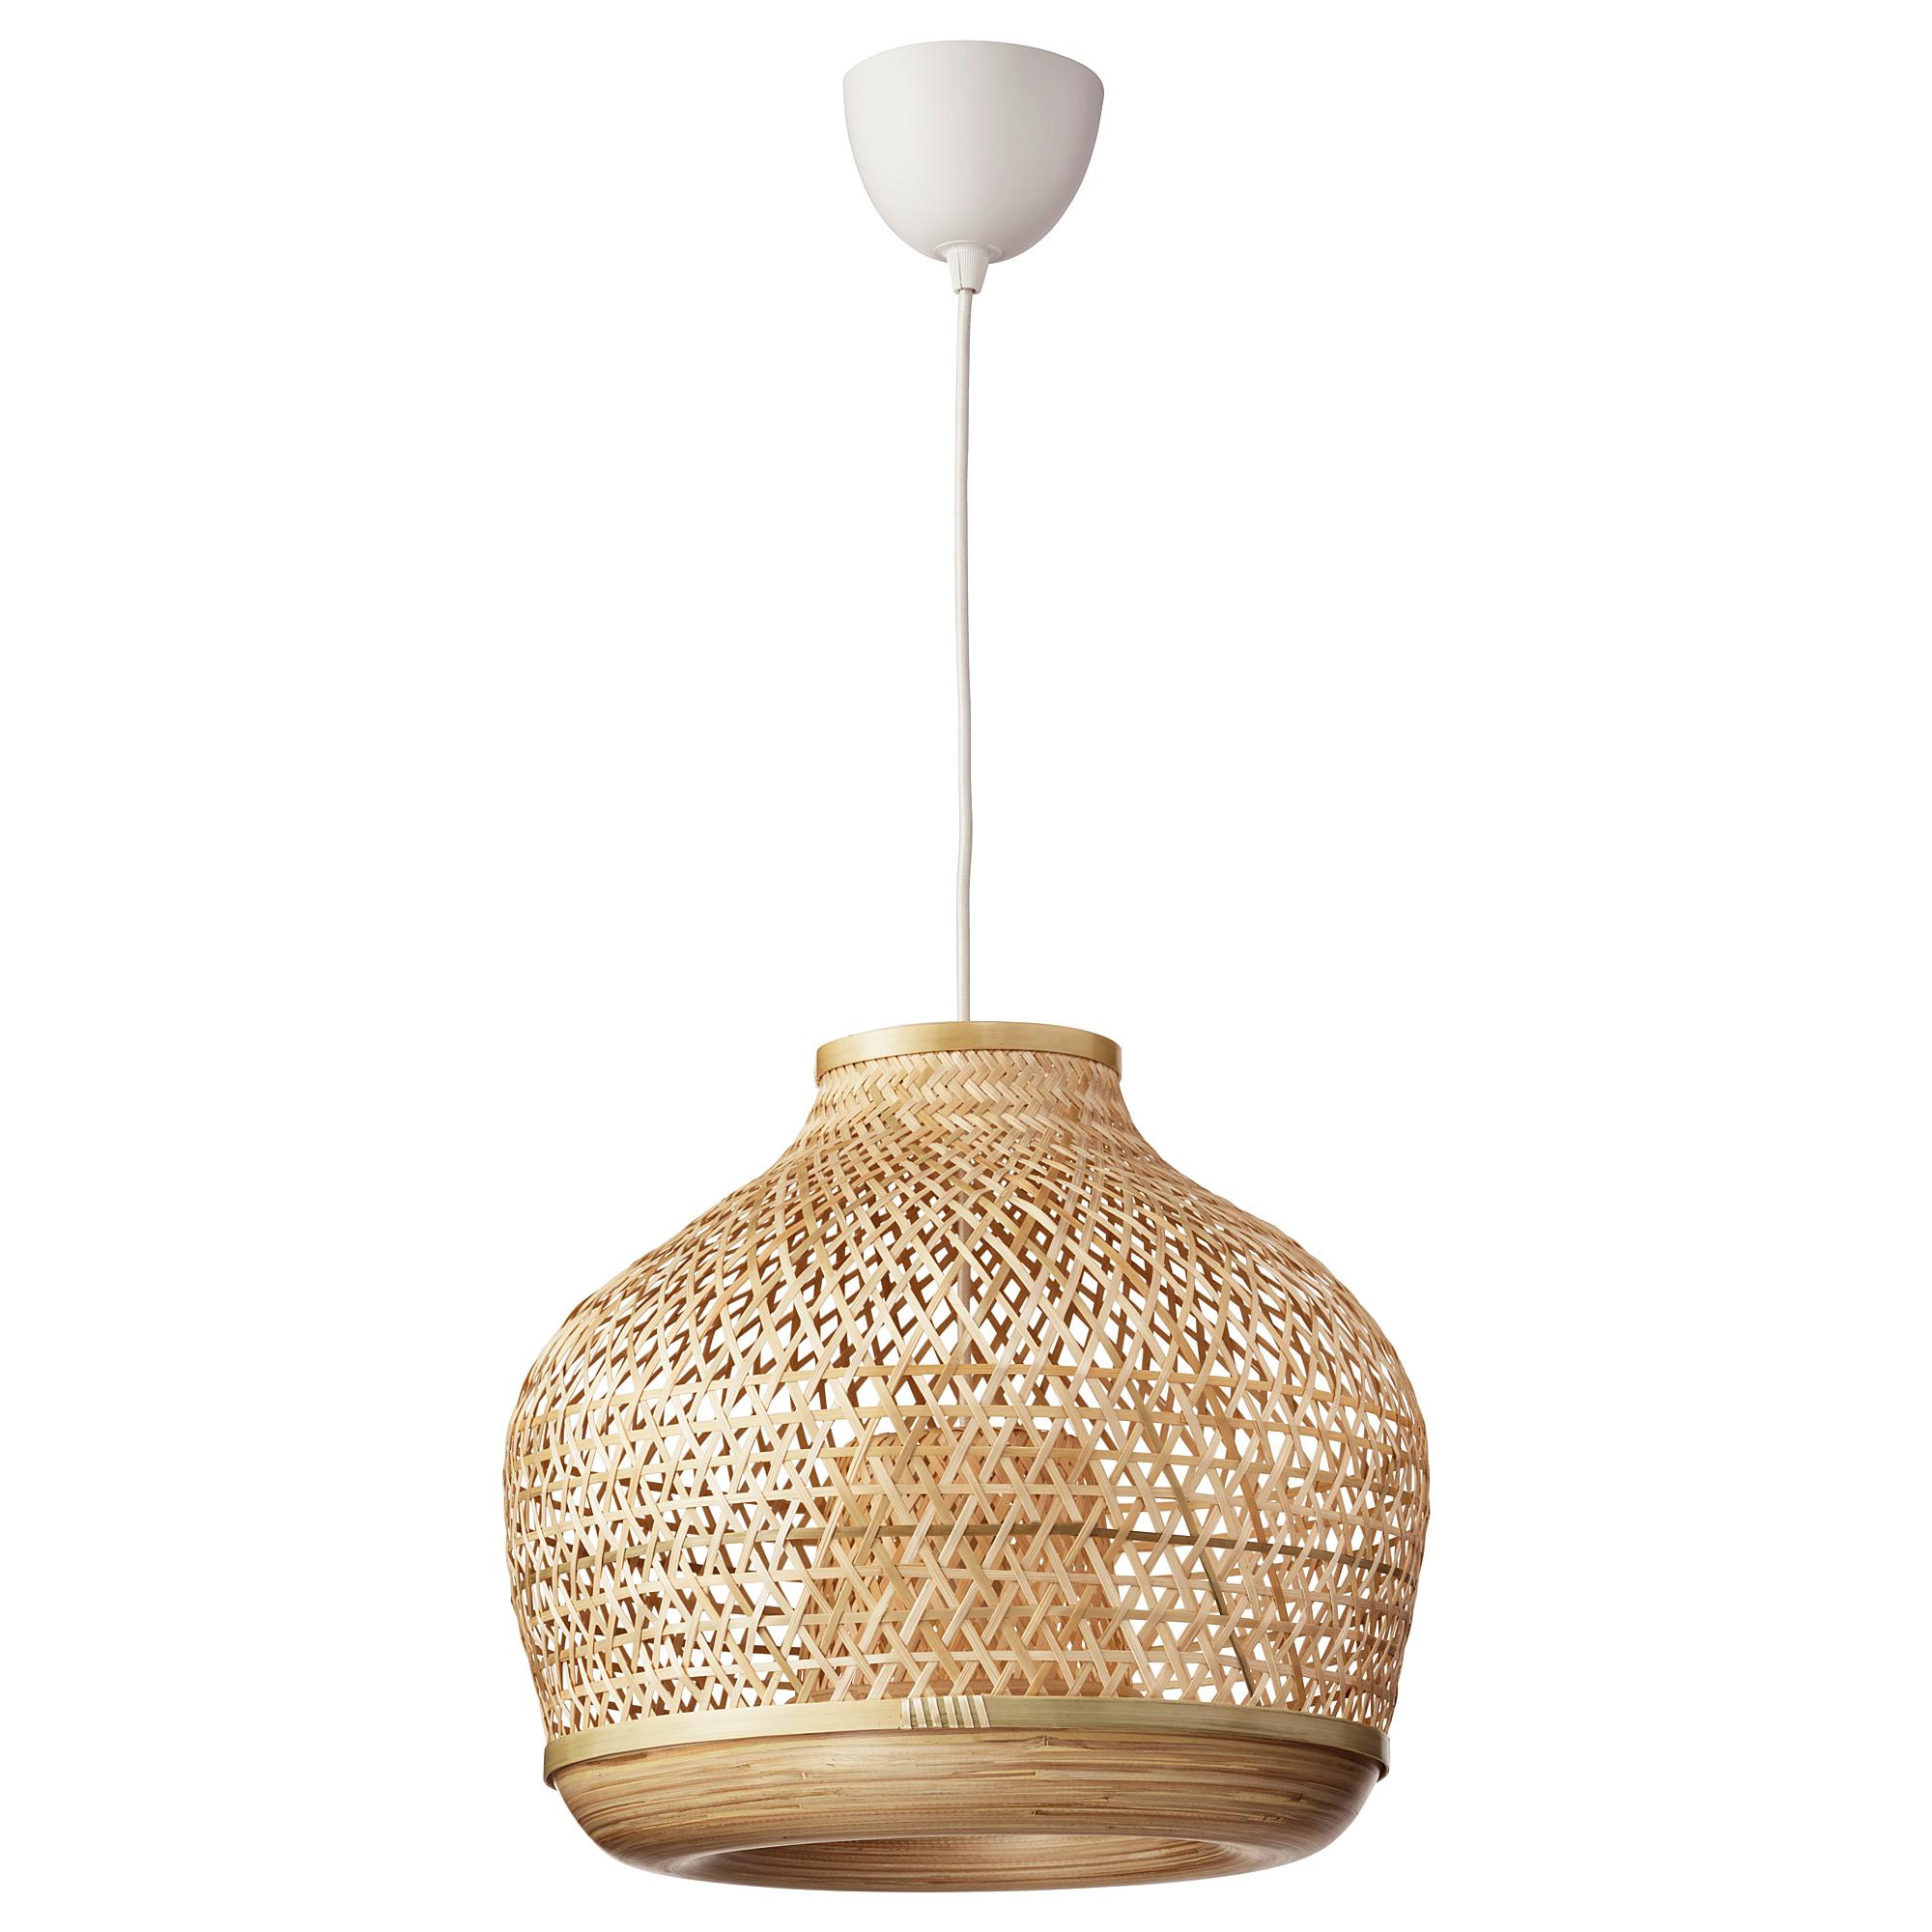 MISTERHULT Pendant lamp, bamboo, 45 cm IKEA in 2020